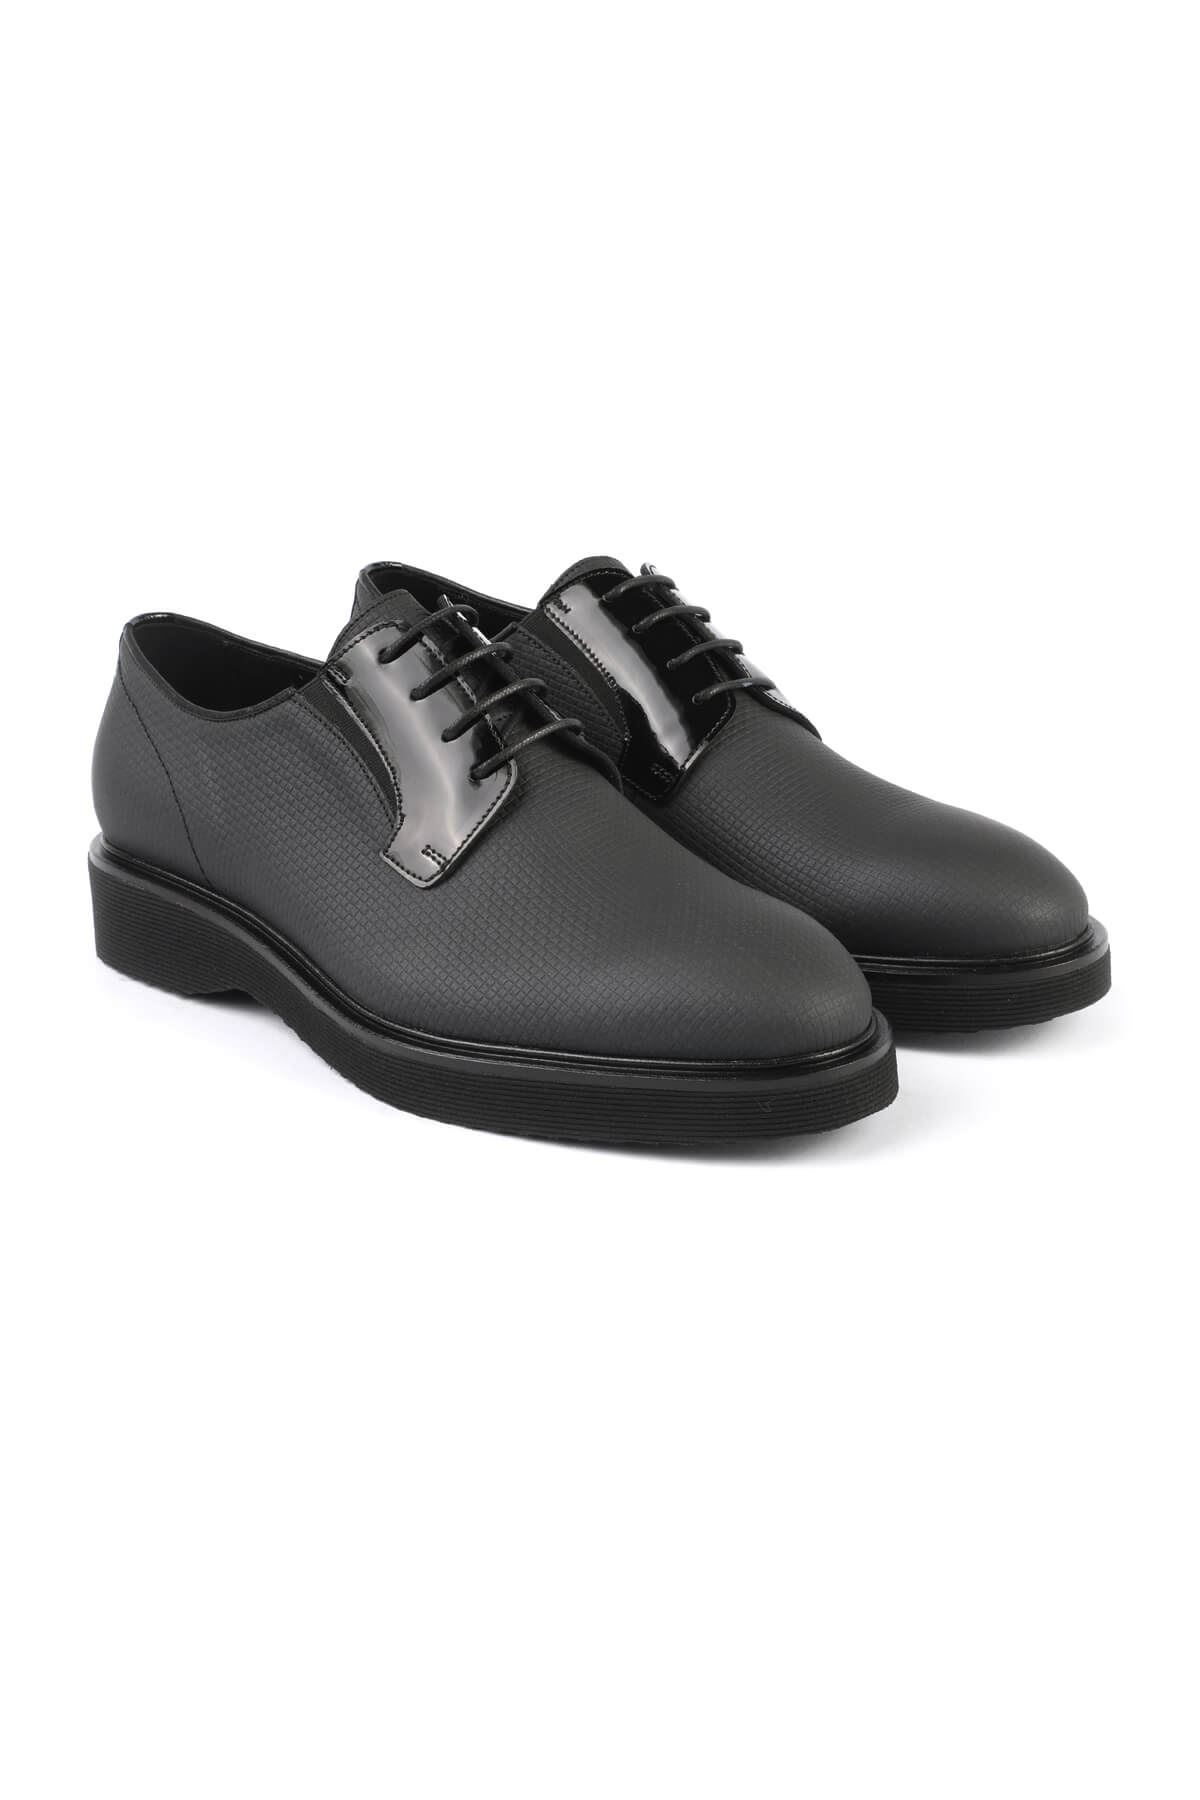 Libero 2700 Black Casual Shoes